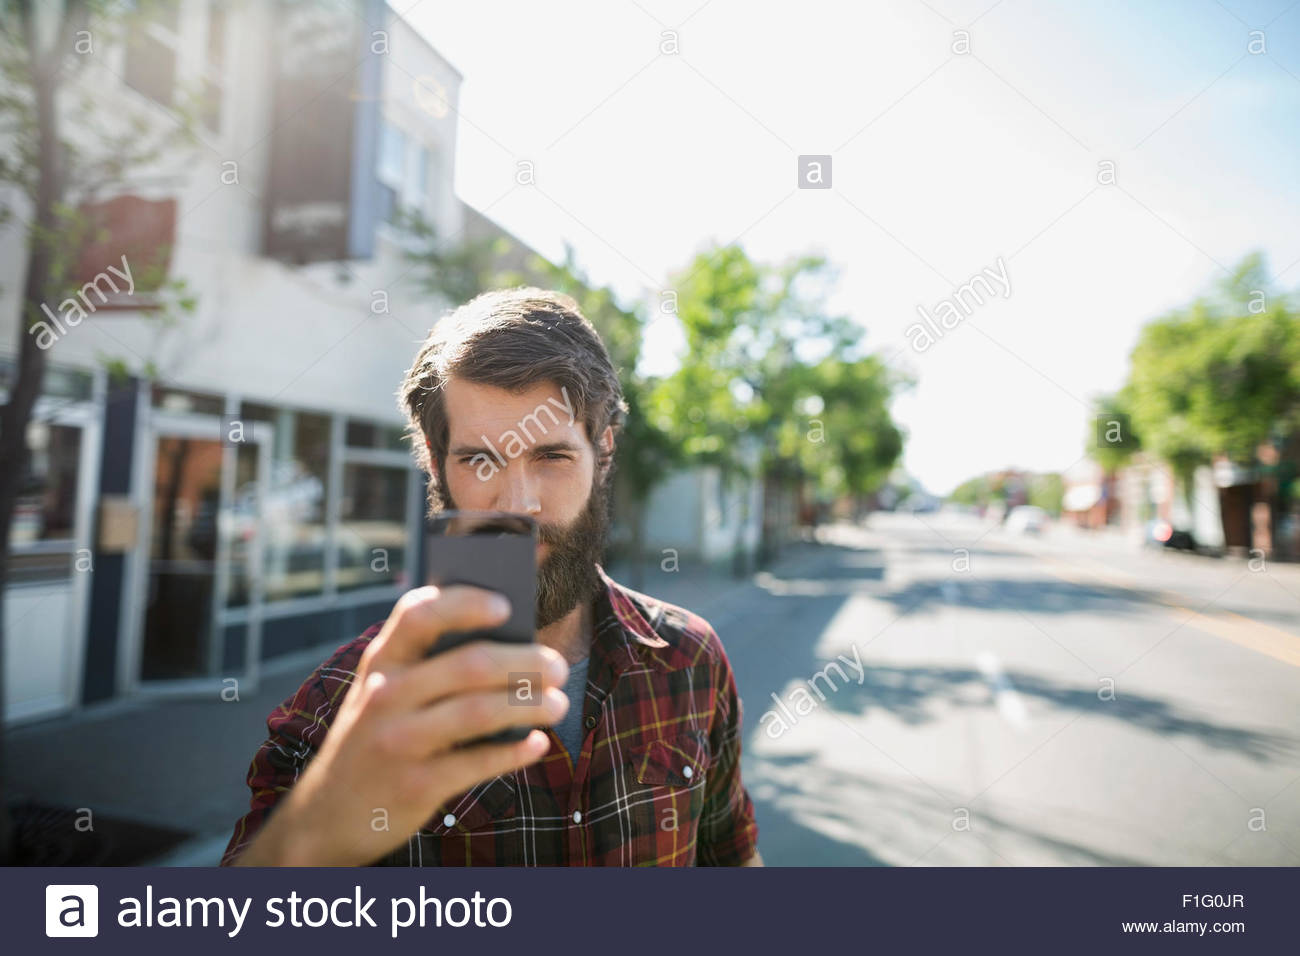 Bärtiger Mann Fotografieren mit der Kamera Telefon sonnige Straße Stockbild